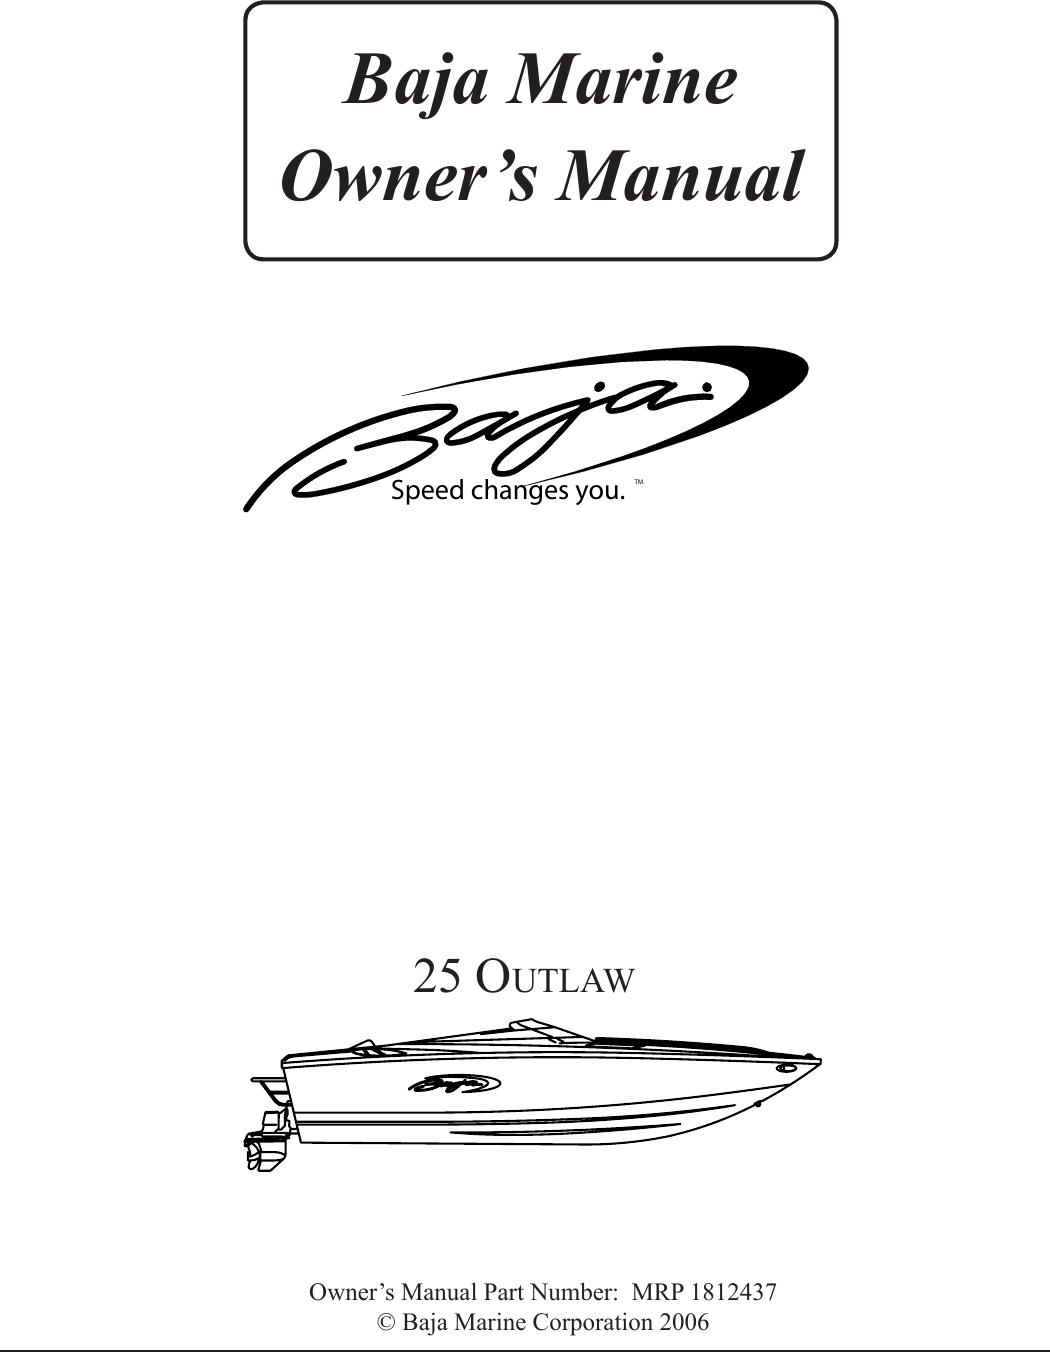 Baja Marine Outlaw 25 Users Manual